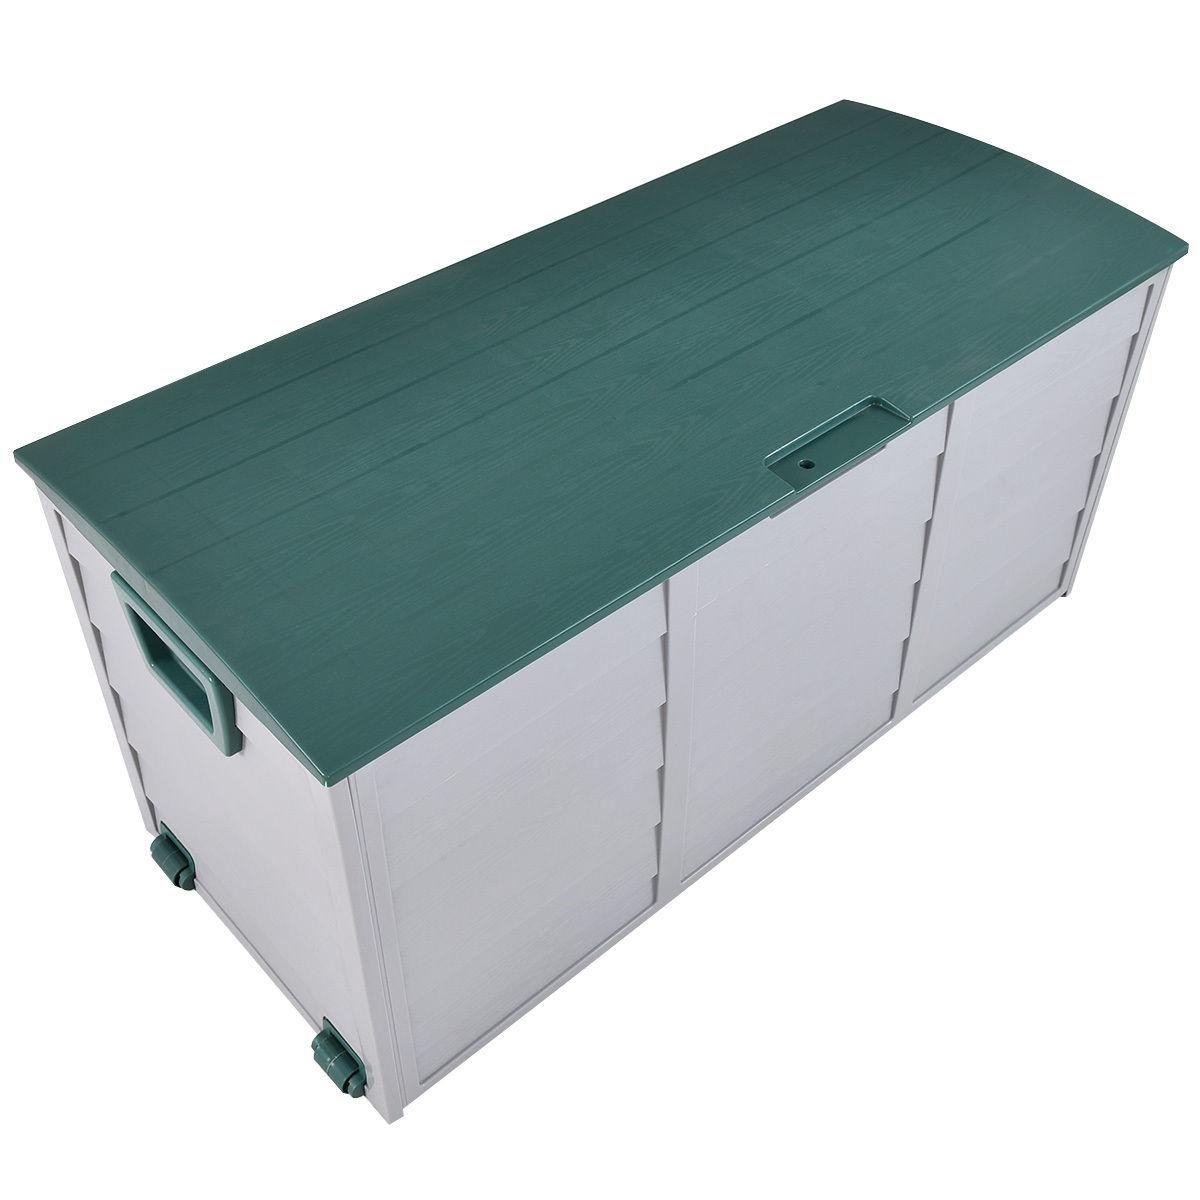 70 Gallon Durable Outdoor Plasic Storage Box